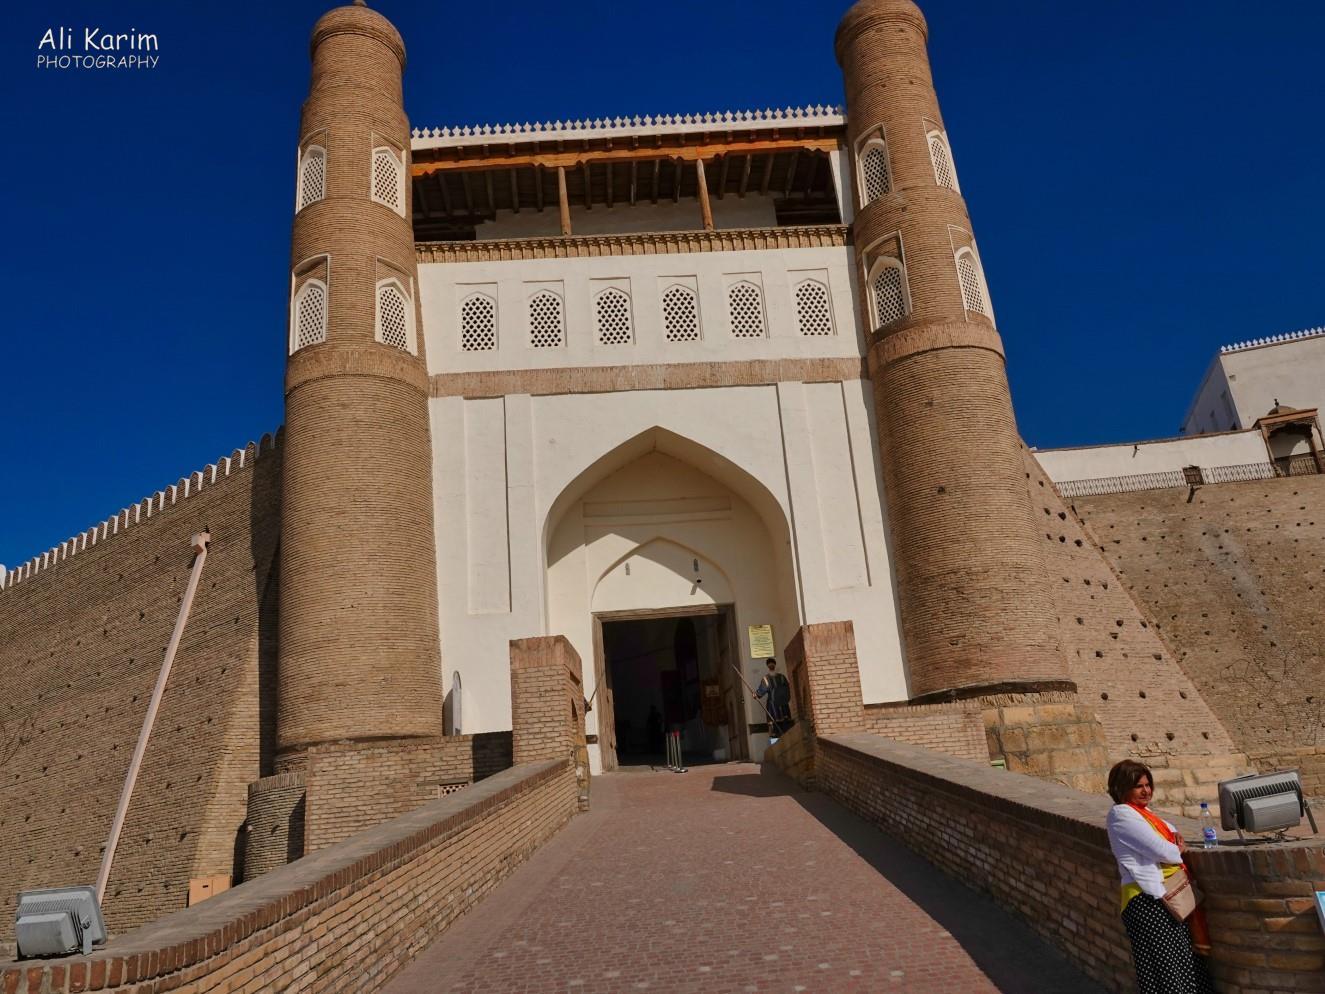 Bukhara, Oct 2019, Entrance to the Arc Citadel